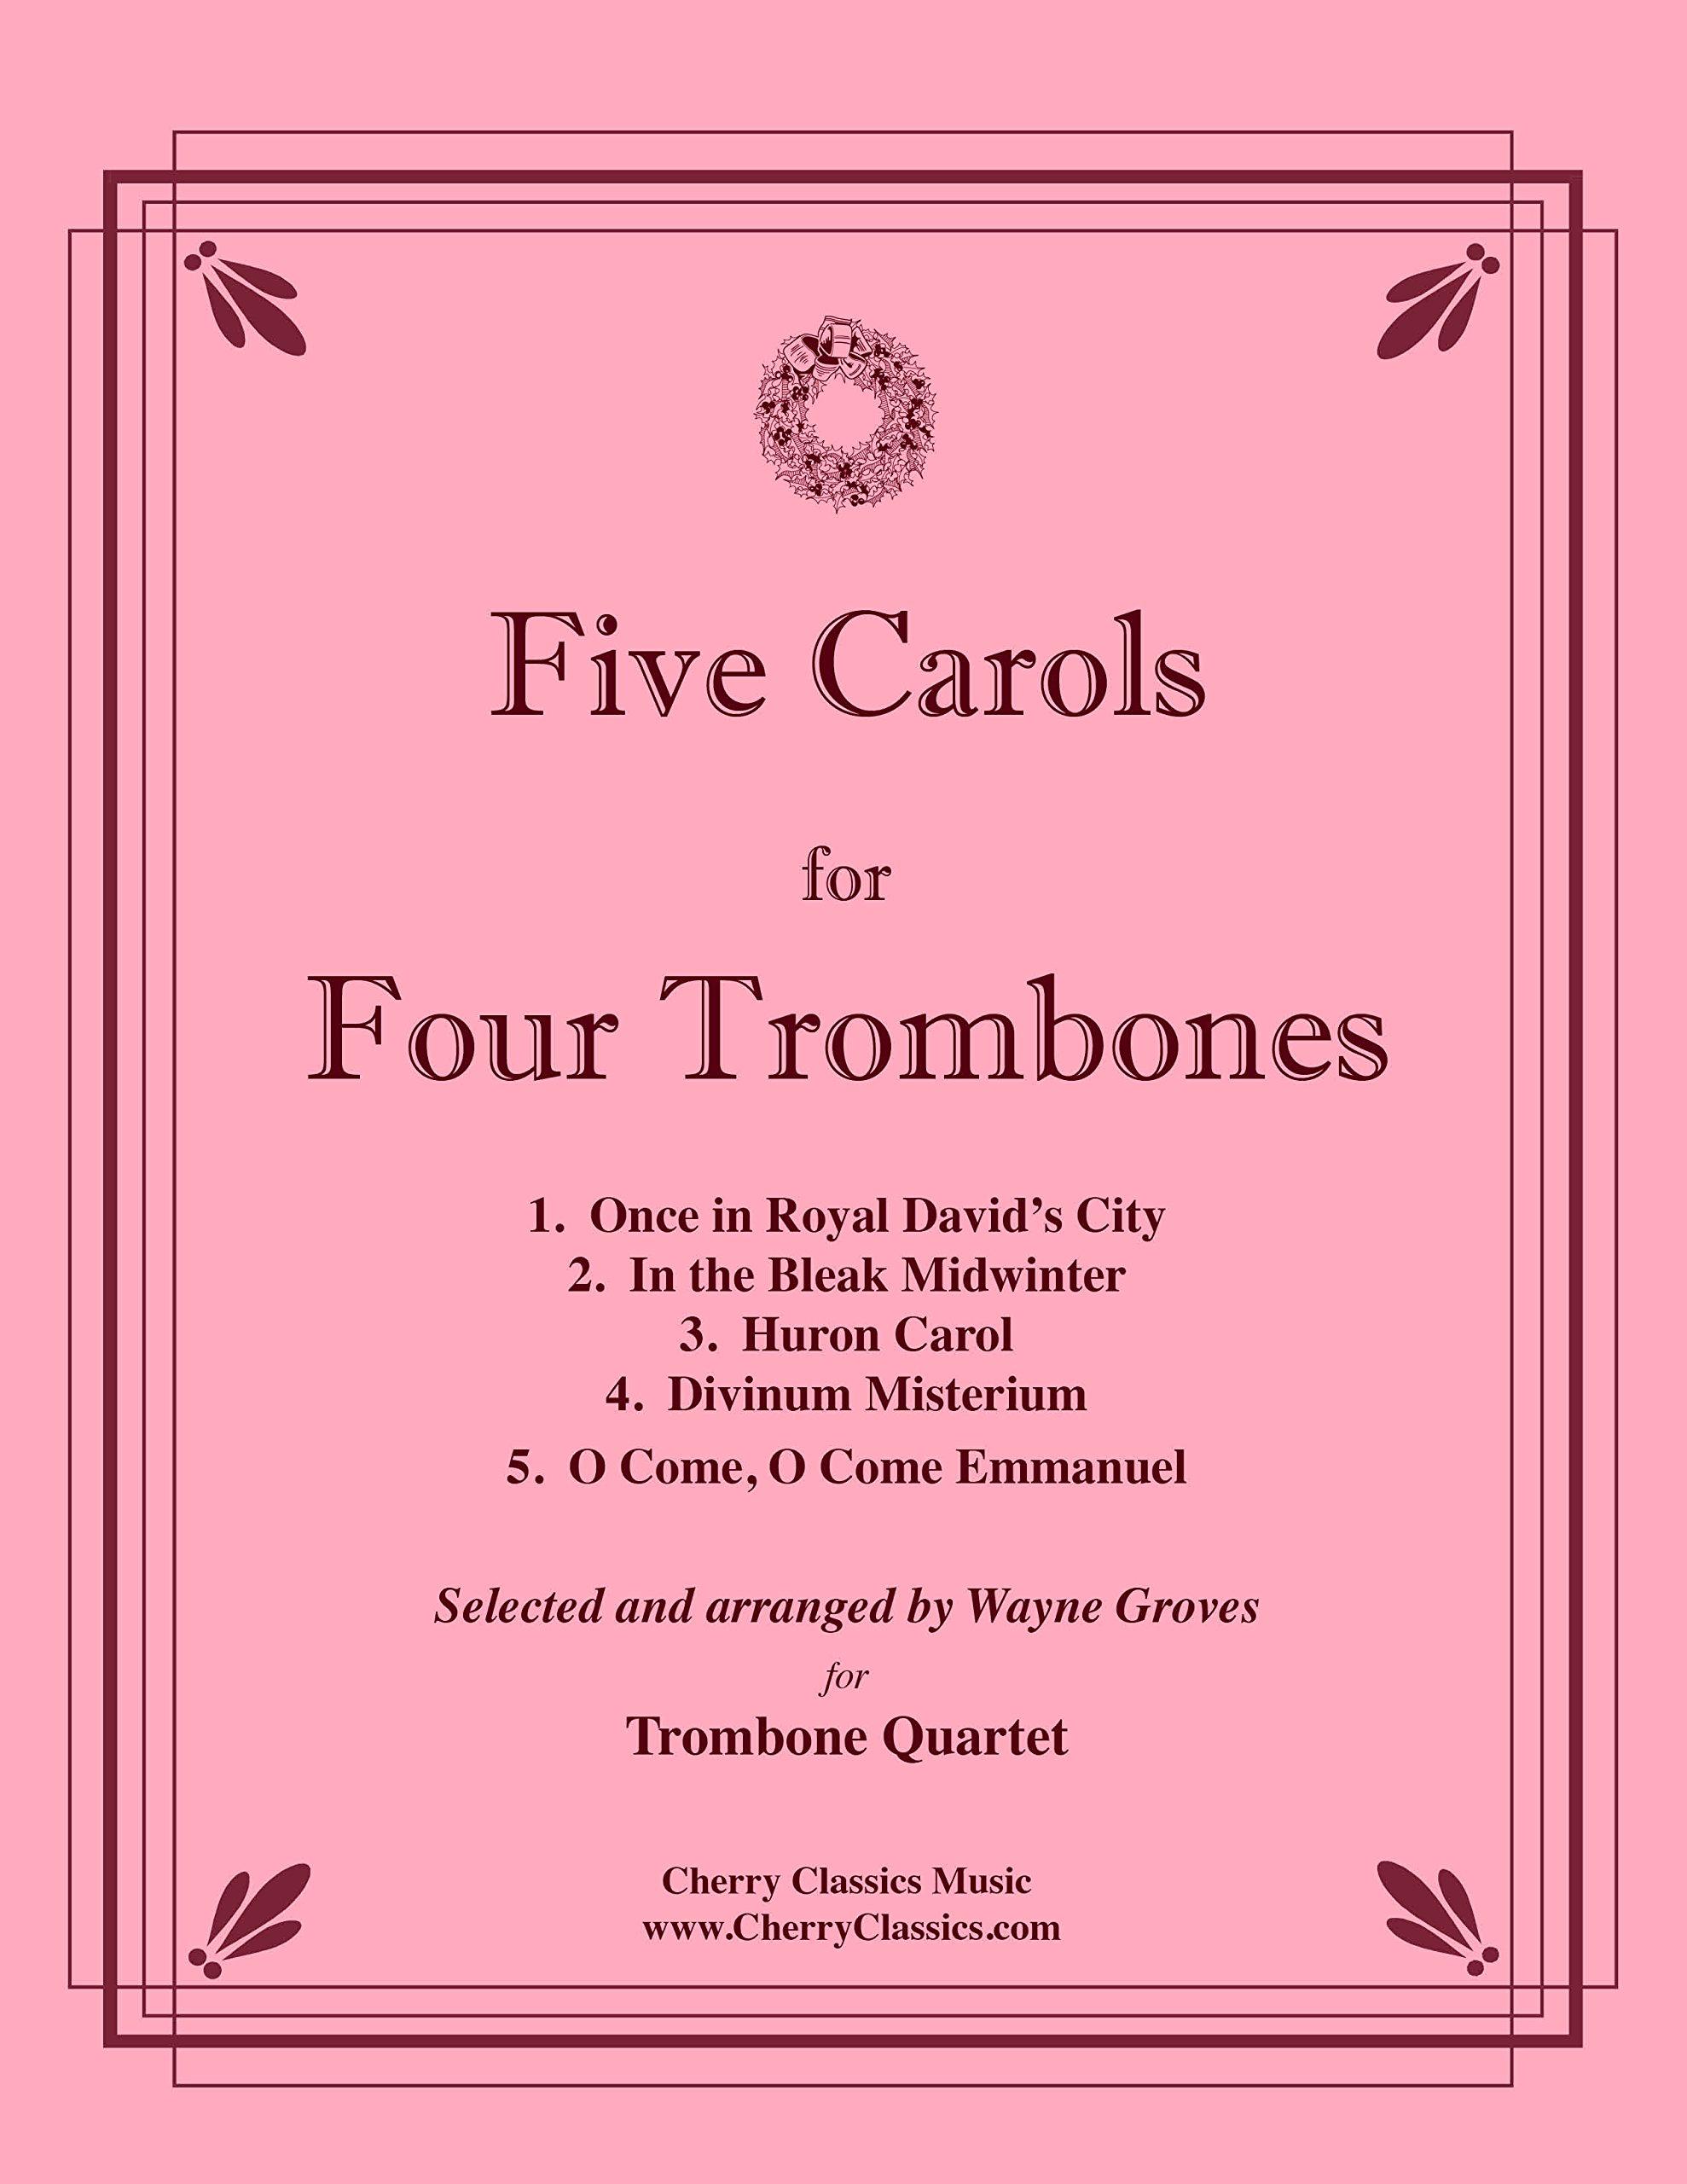 Five Carols for Four Trombones